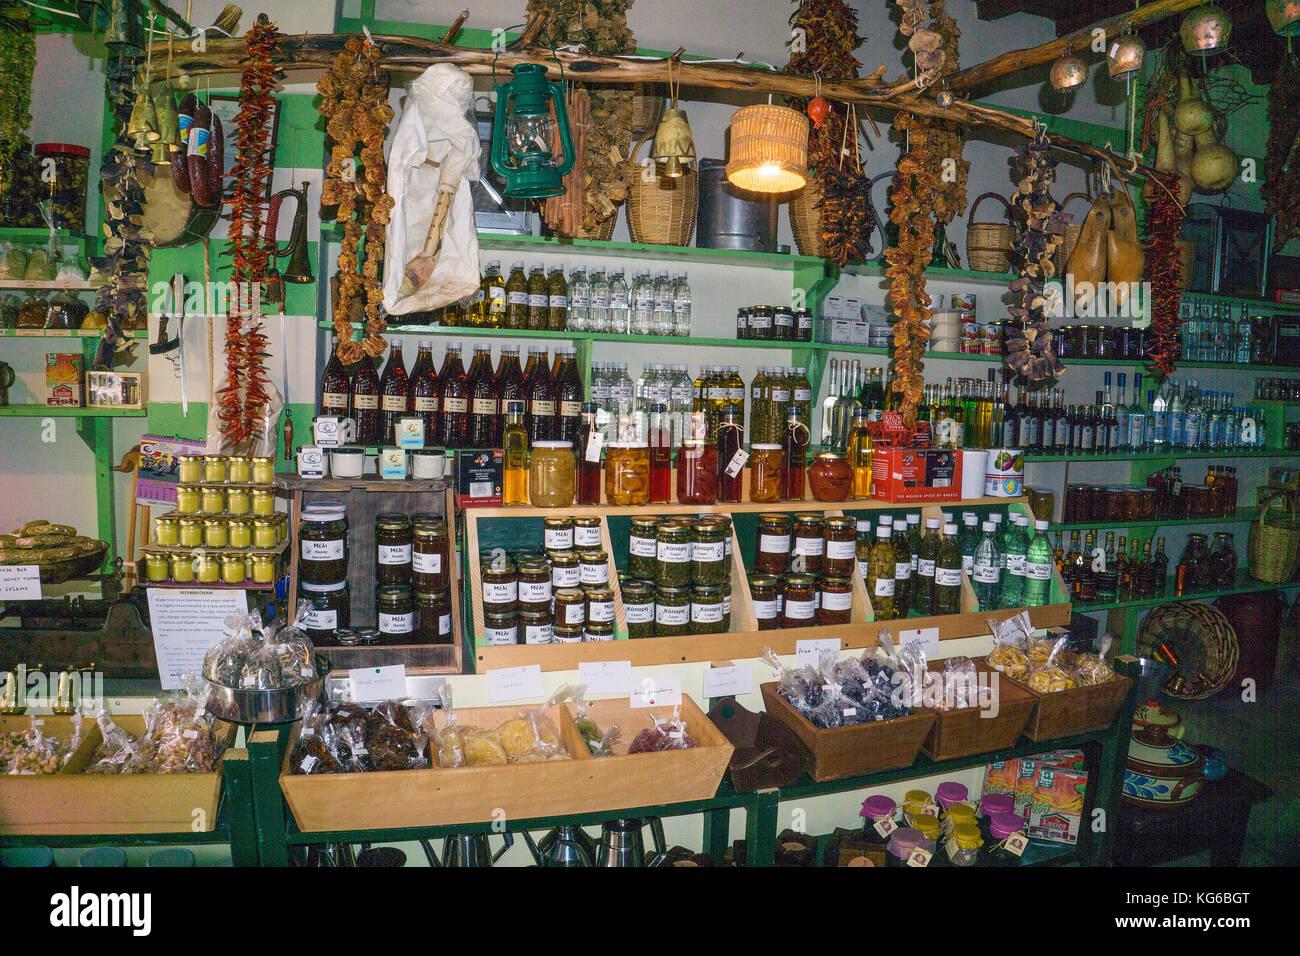 Lokale Spezialitäten in einem Geschäft, Apiranthos, Insel Naxos, Kykladen, Ägäis, Griechenland Stockbild